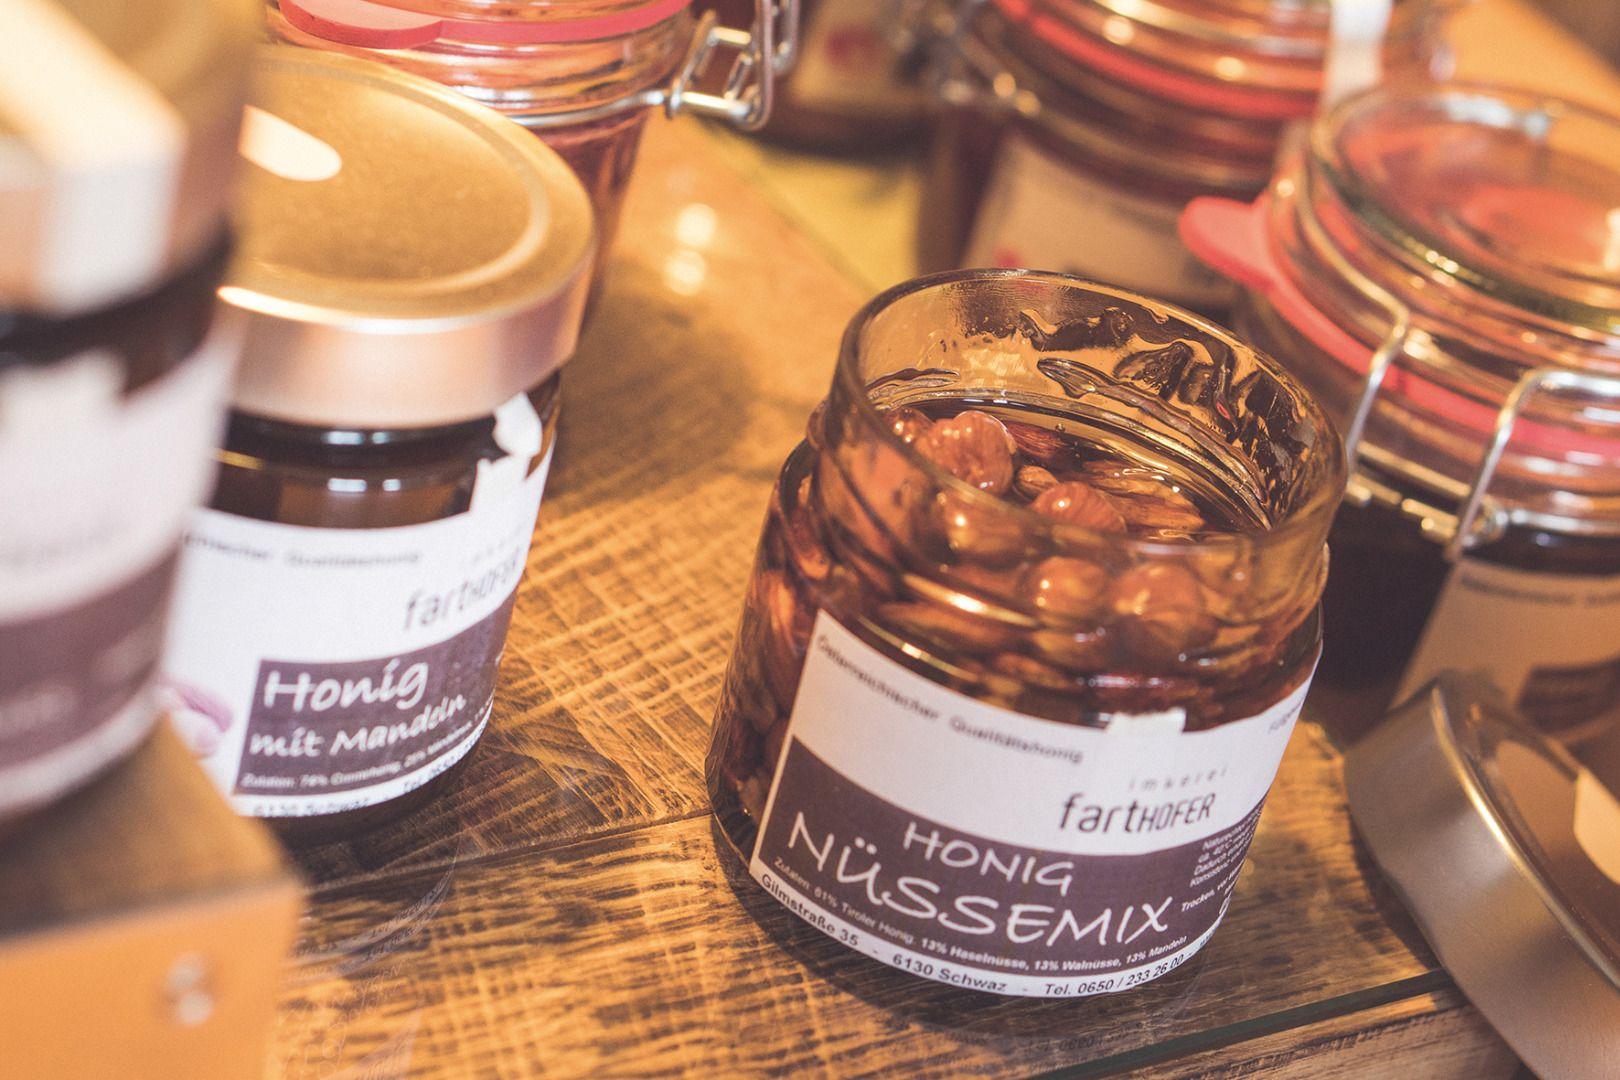 Honigprodukte - Imkerei Farthofer